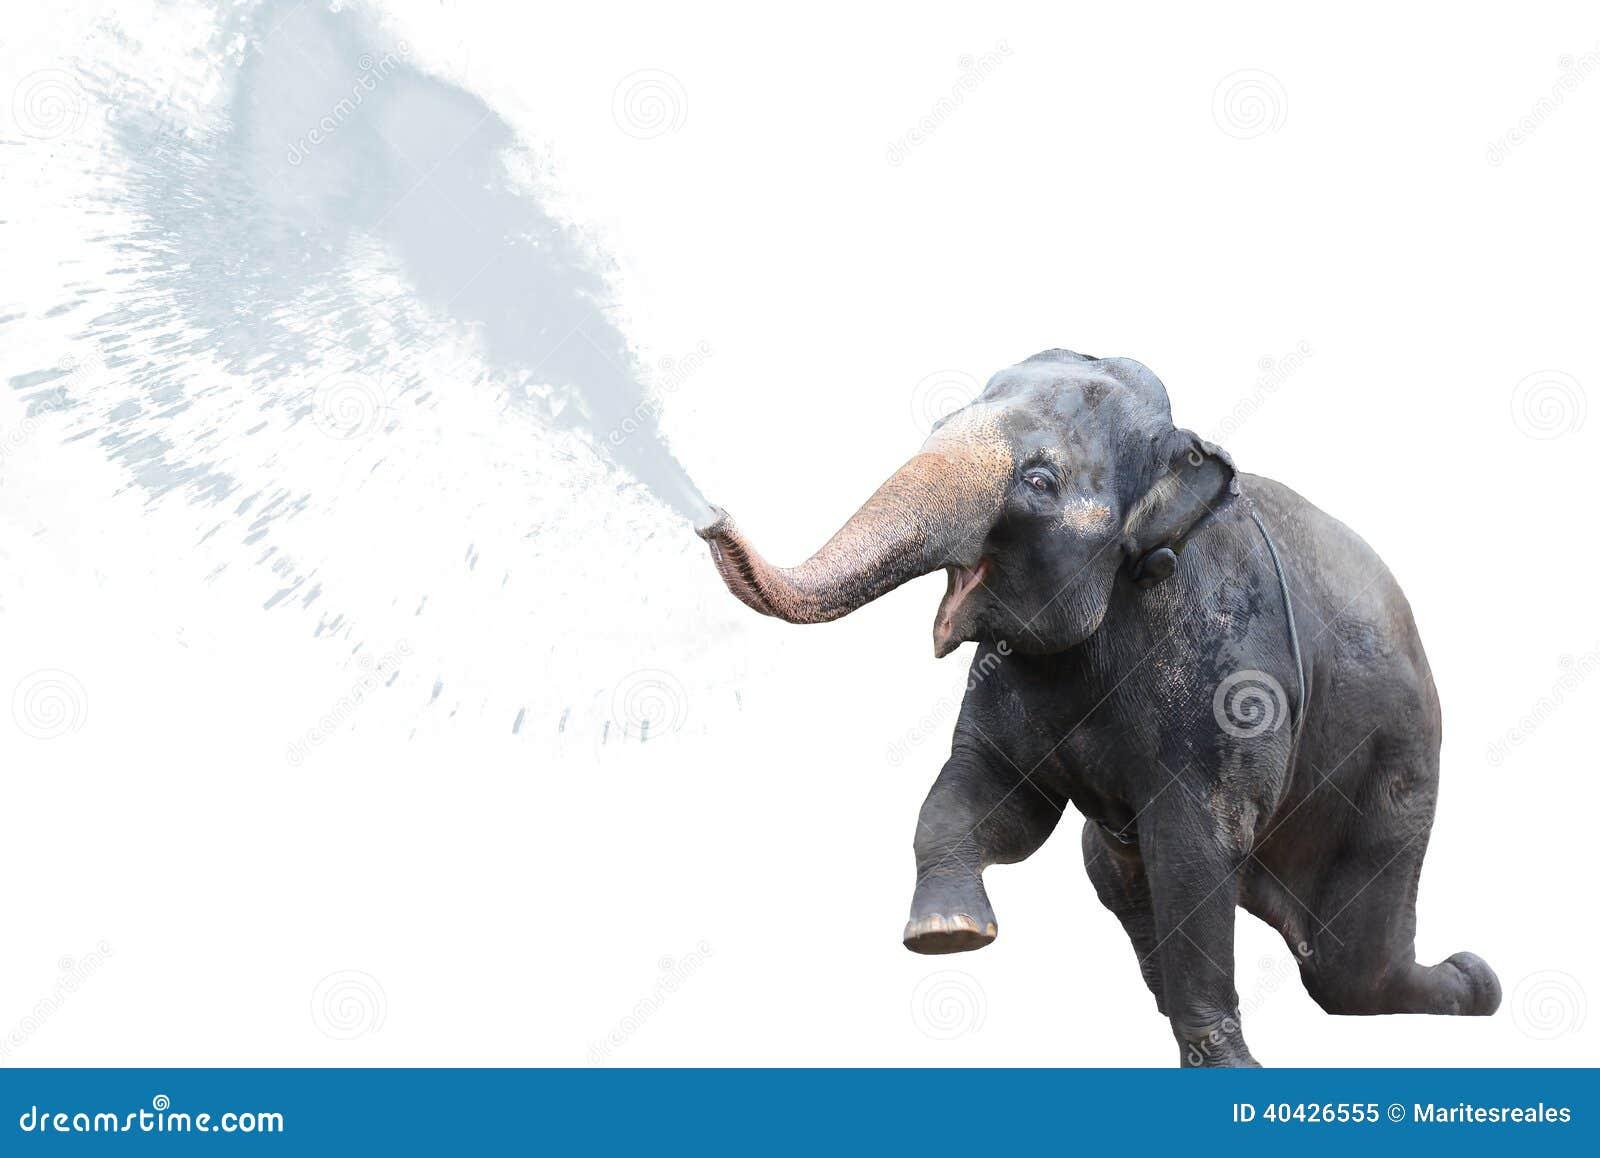 Elephant spraying water - photo#18